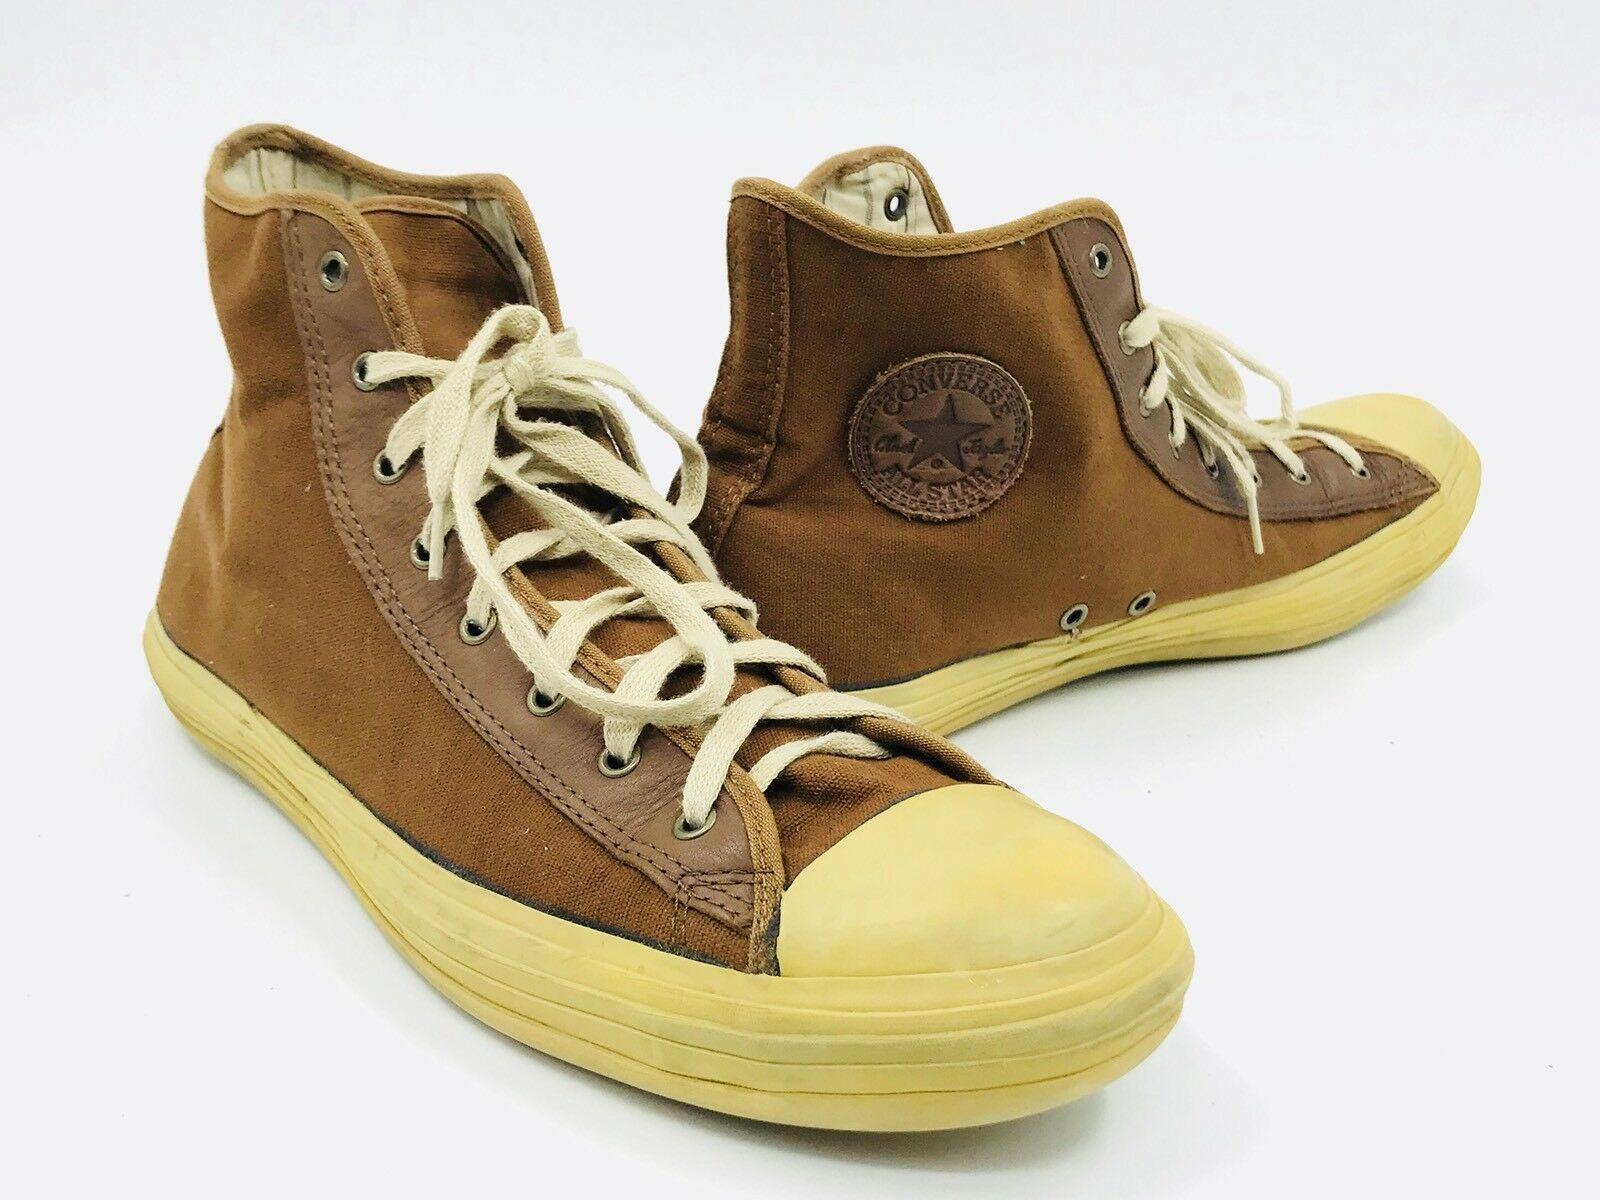 5bd4572c73f Converse John Varvatos Brown Hightop Sneakers Mens Size 12 - Rare ...